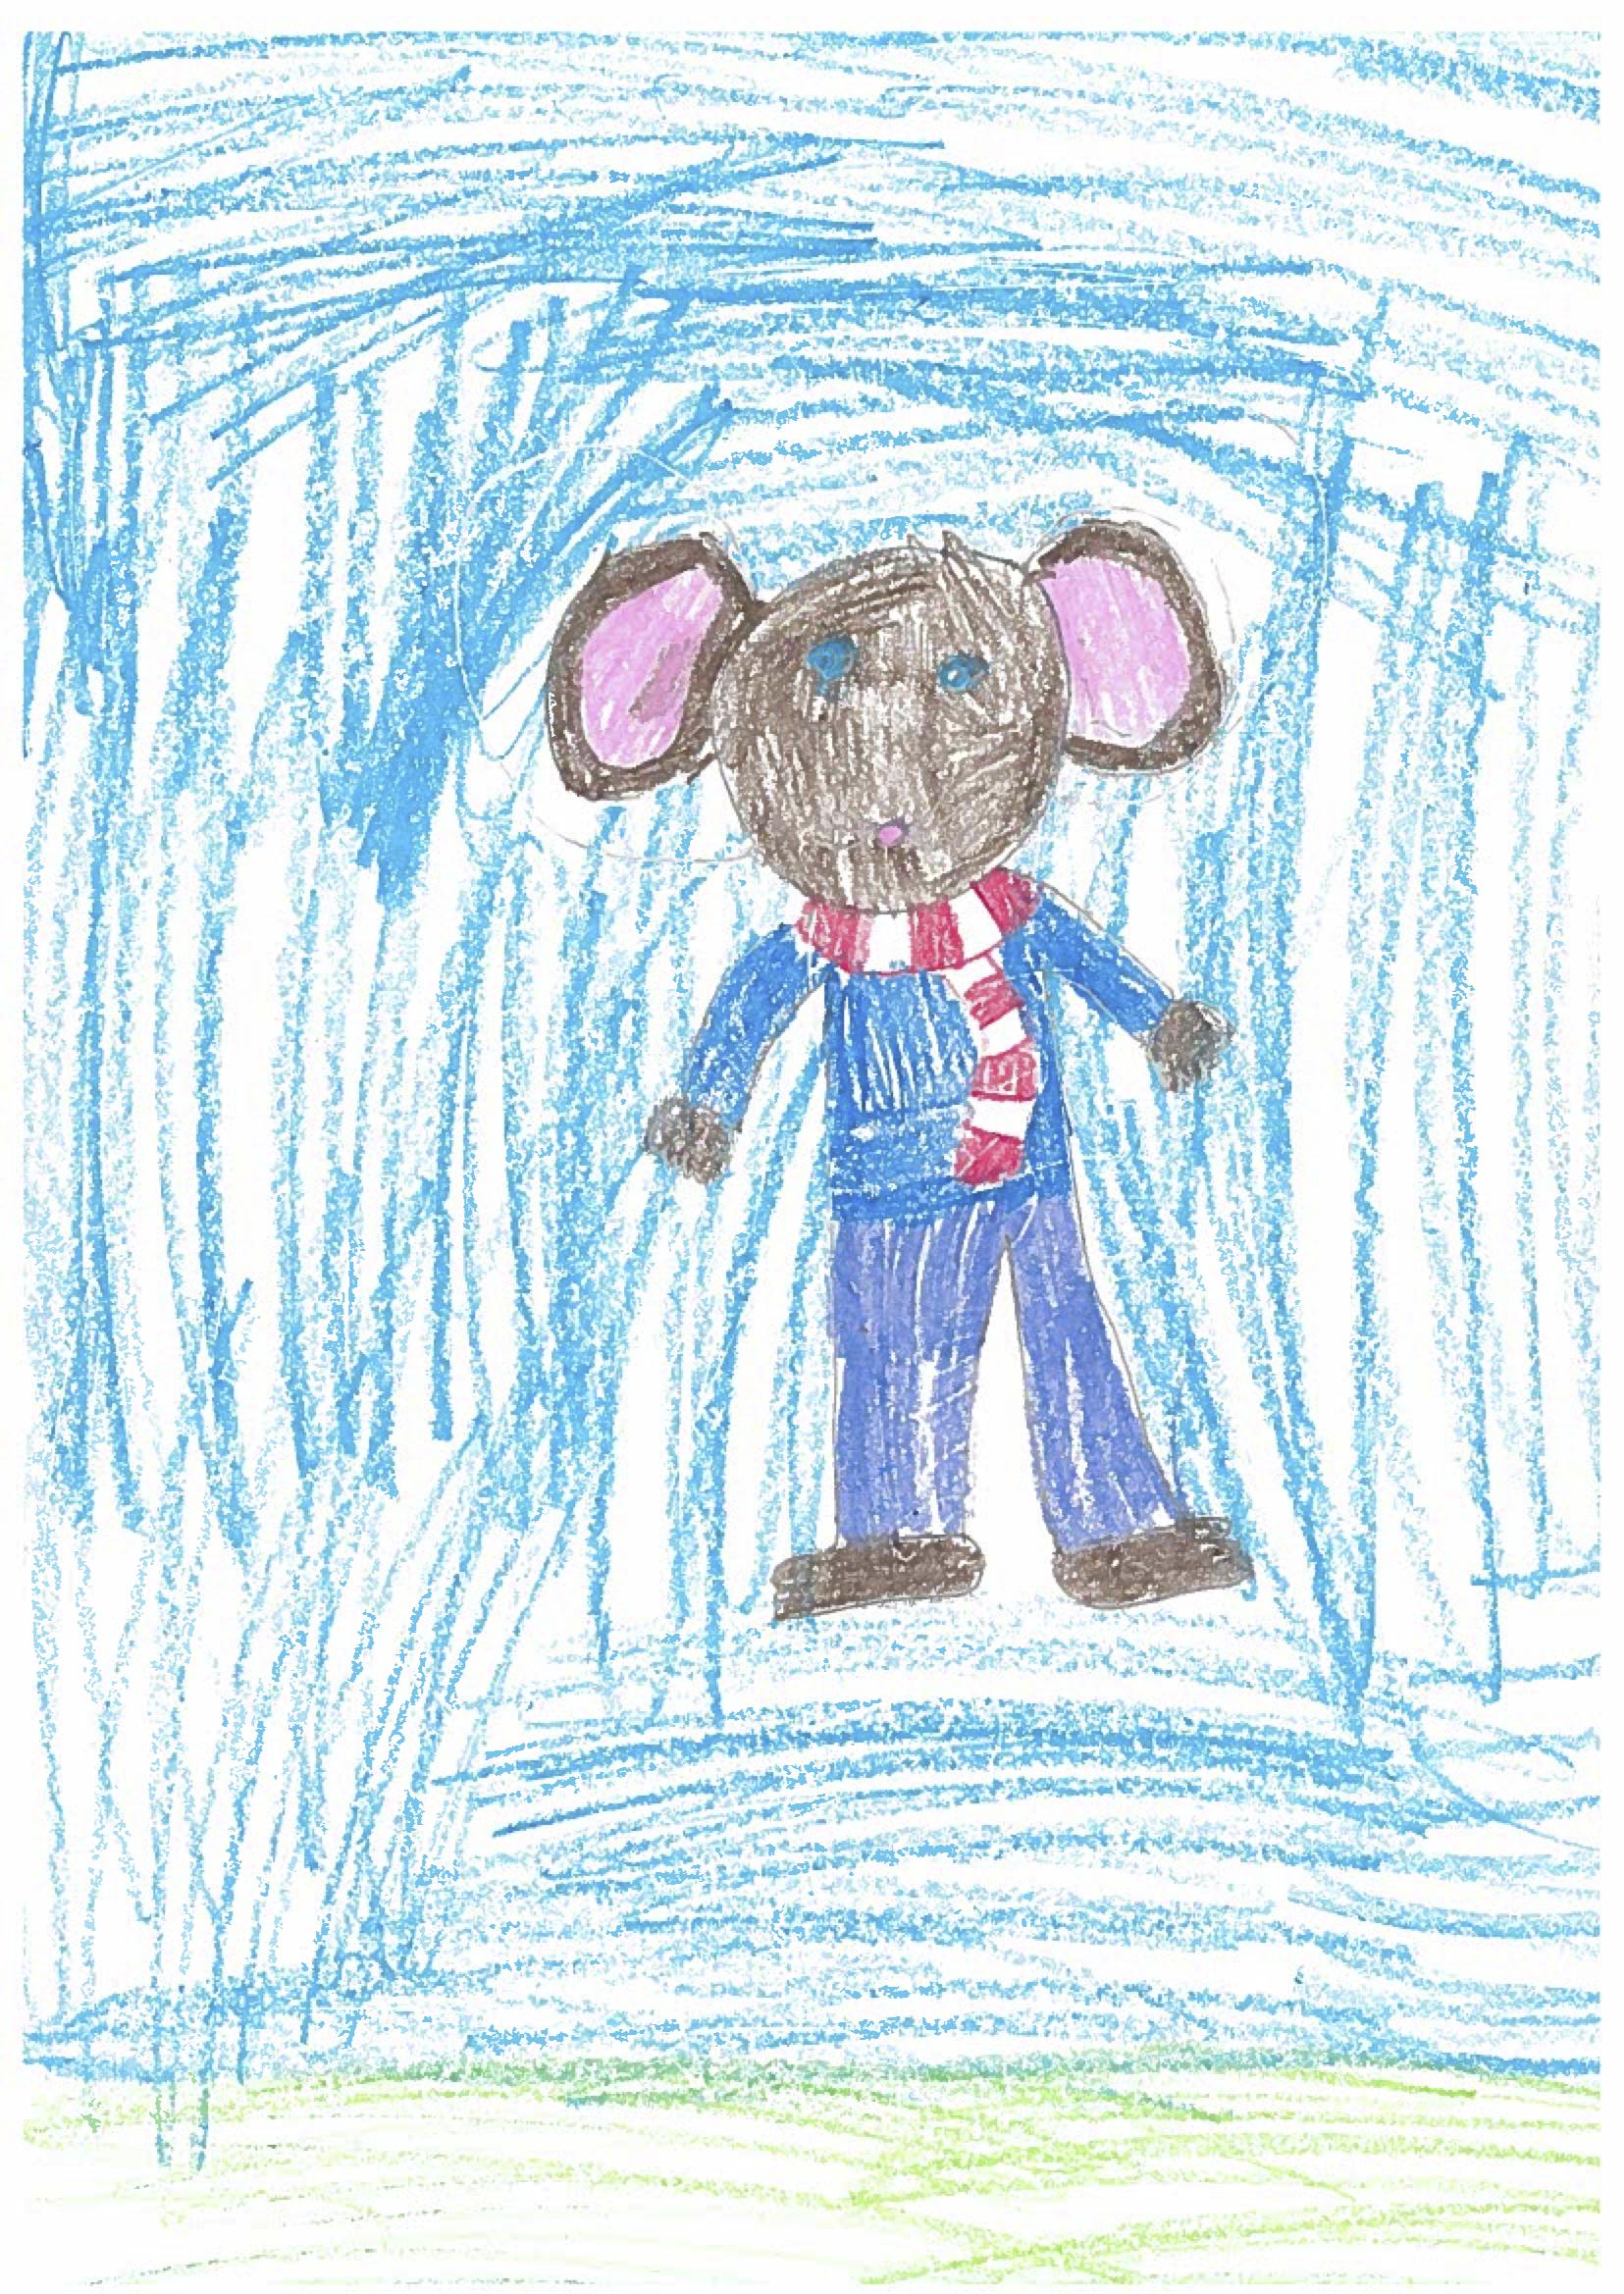 By Jordan, 2nd Grade